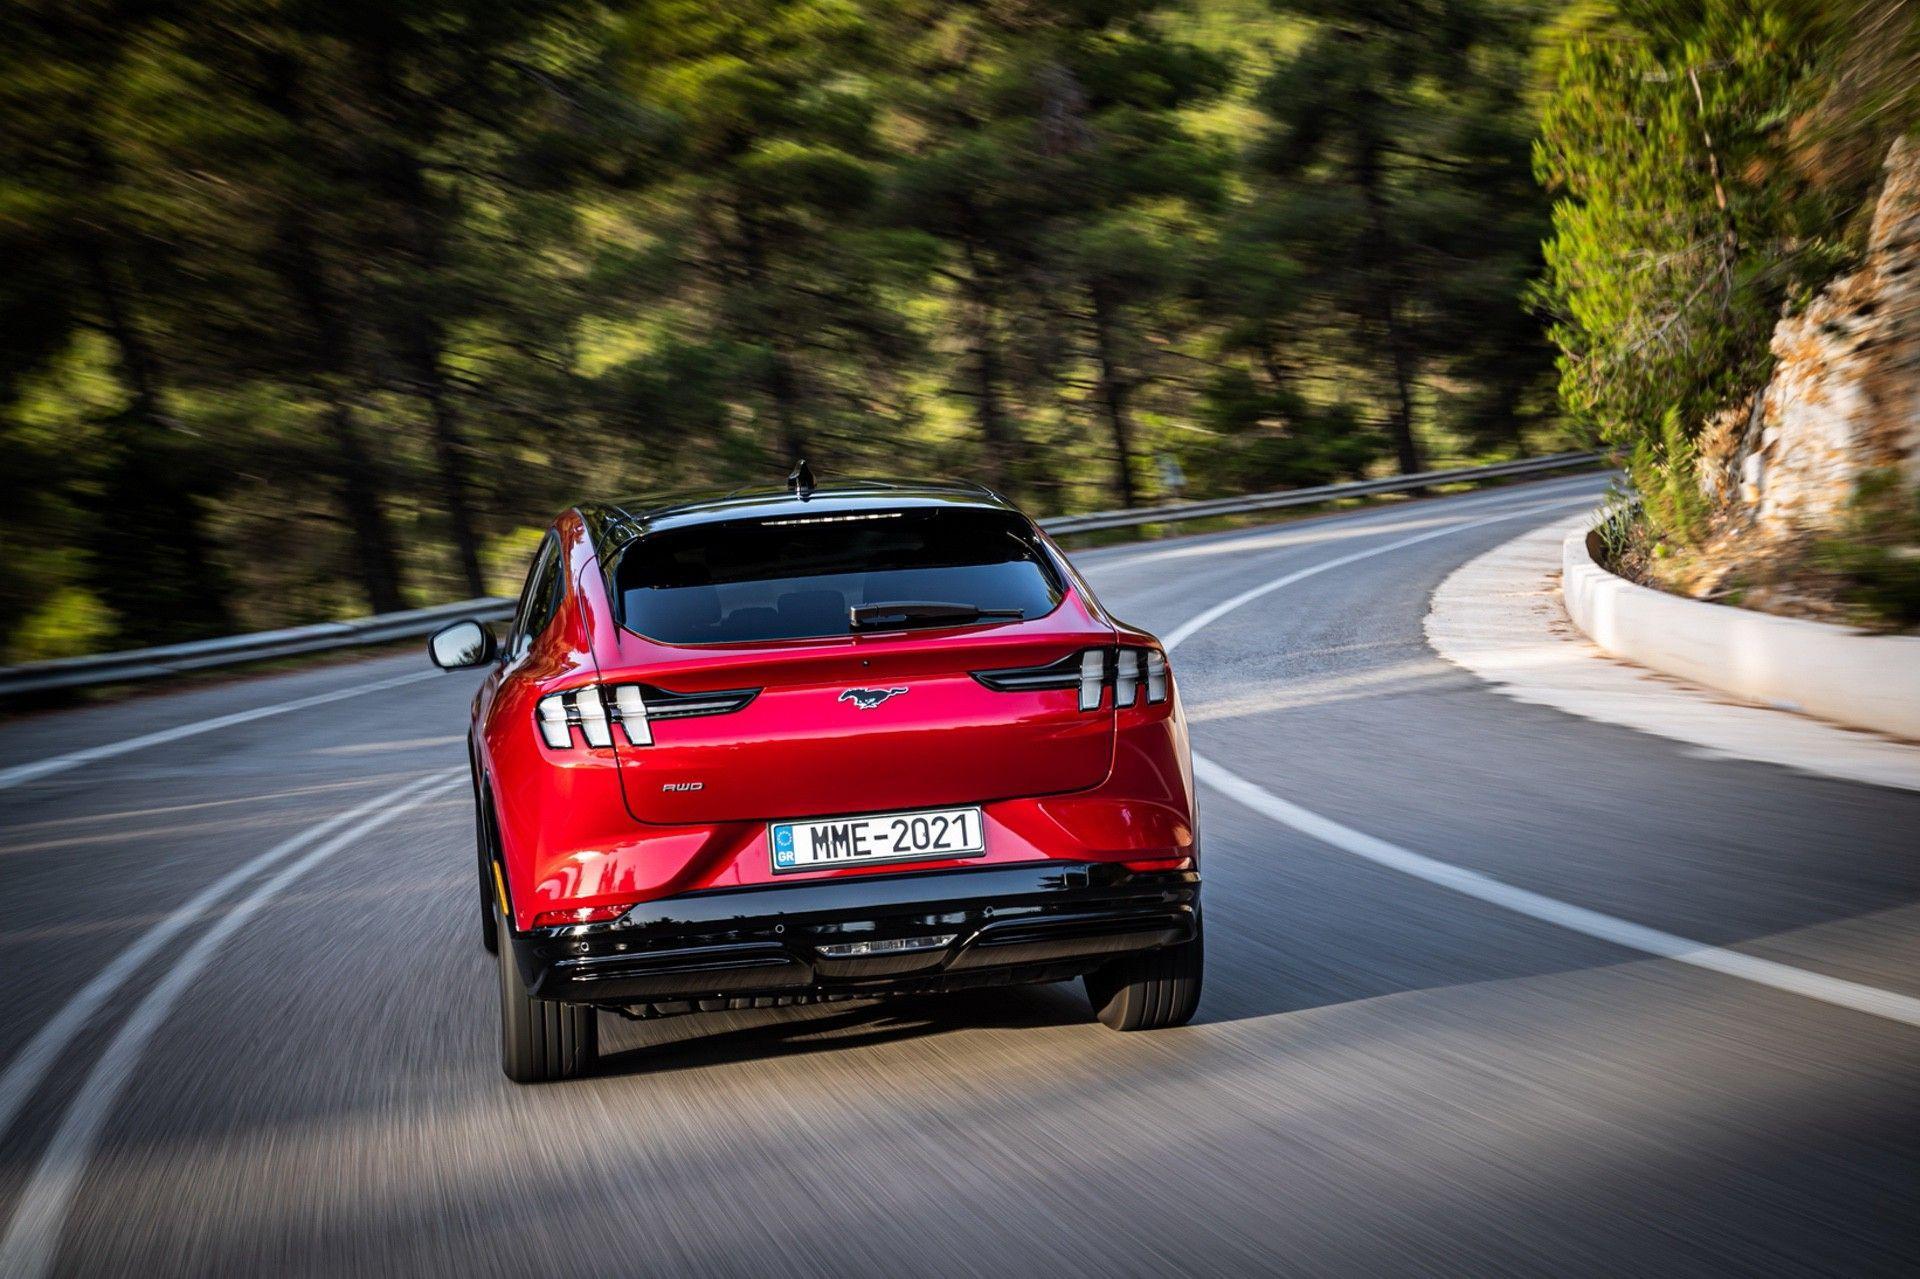 Ford_Mustang_Mach-E_greek_presskit-0095